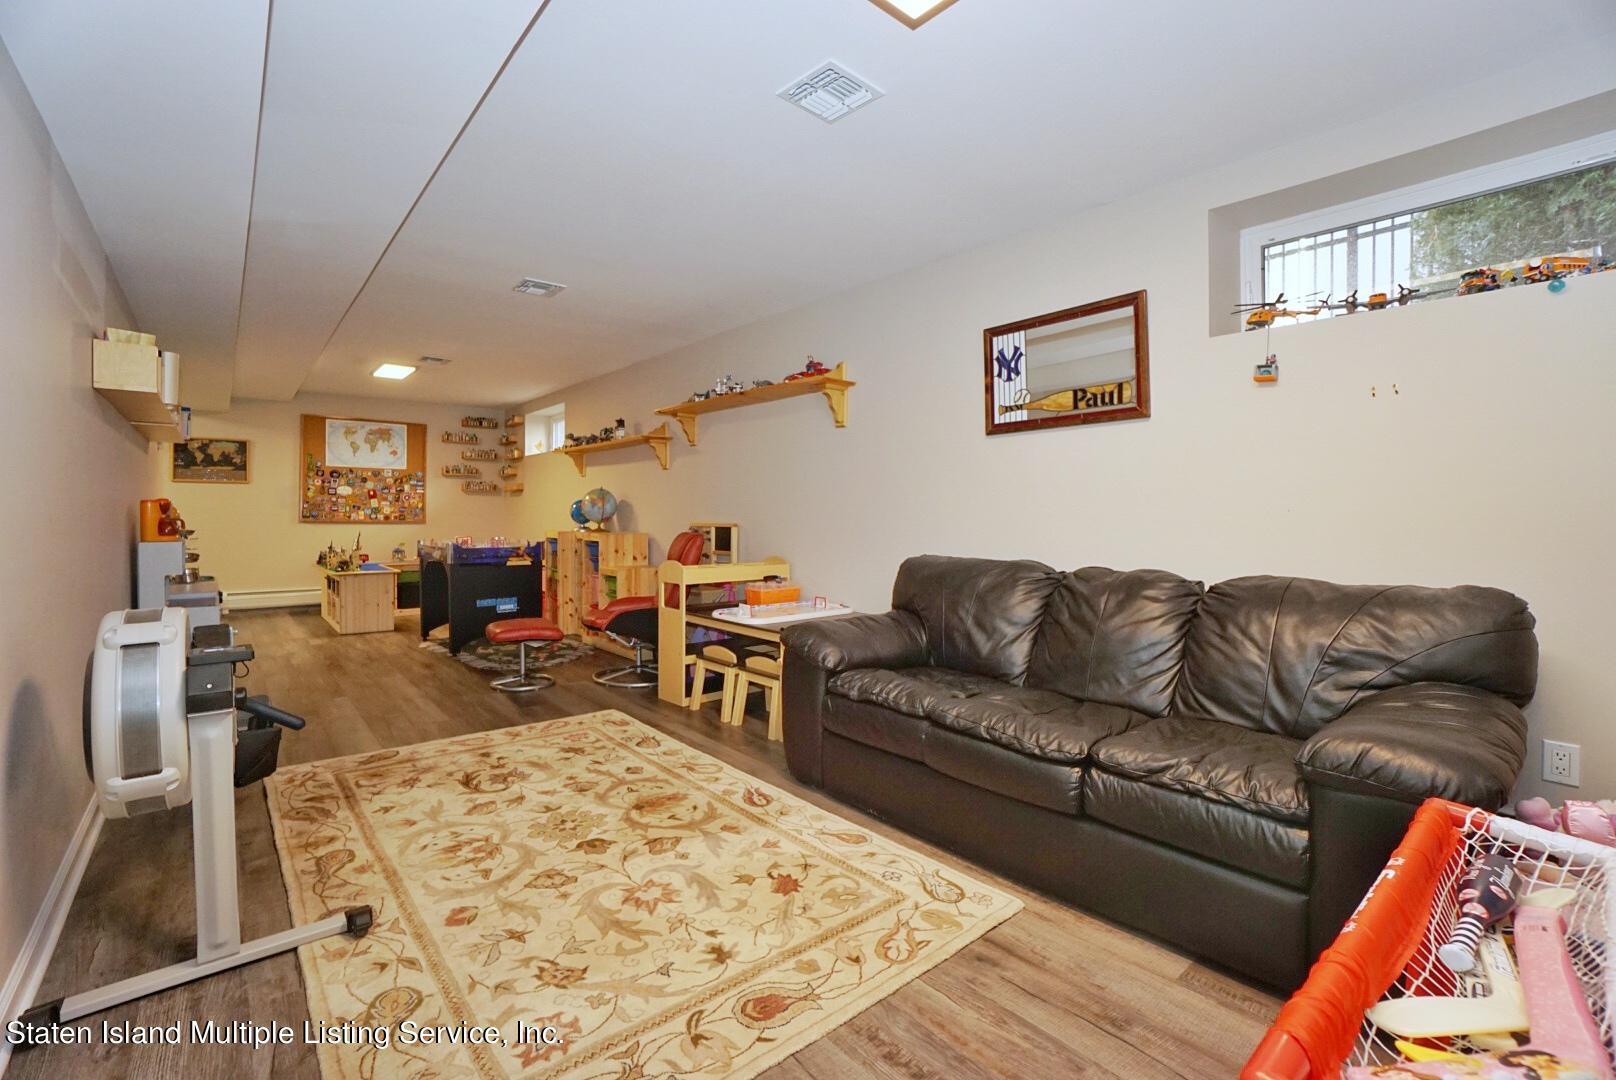 Single Family - Detached 31 Belwood Loop  Staten Island, NY 10307, MLS-1143133-52